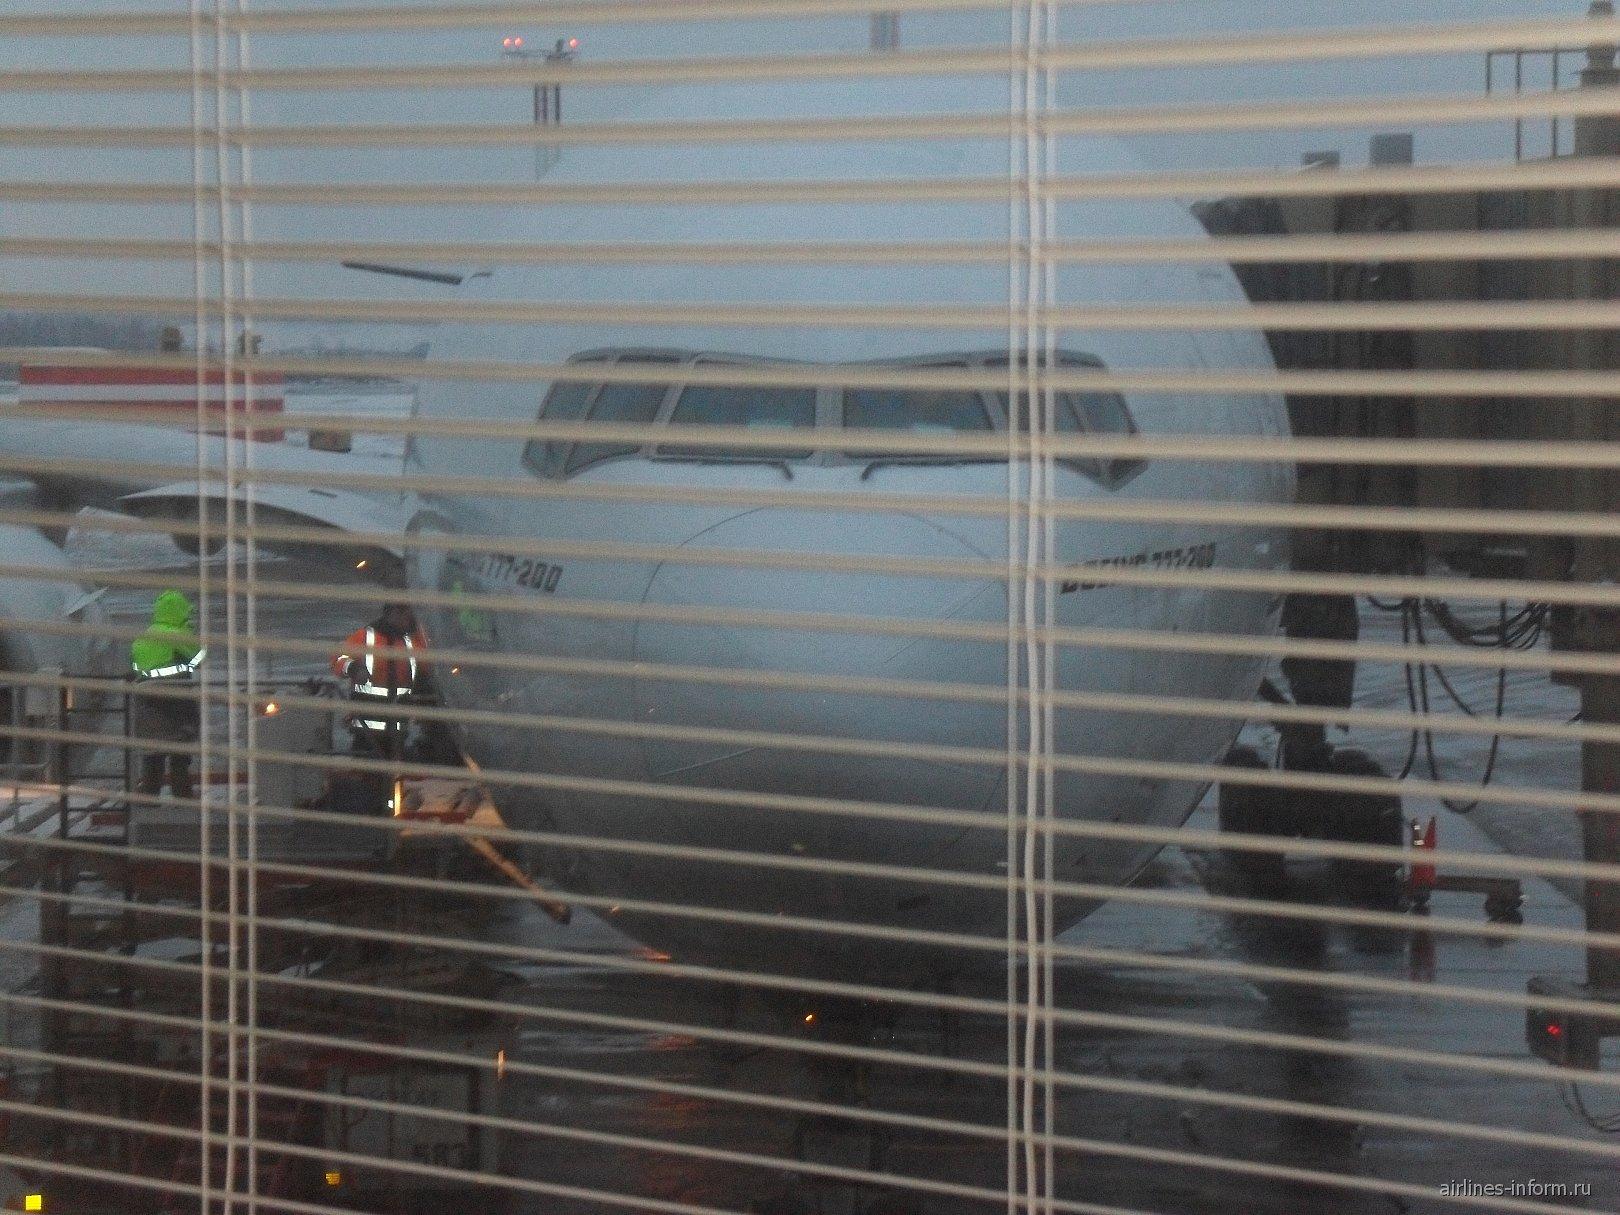 Посадка на рейс Петербург-Дубай авиакомпании Эмирейтс